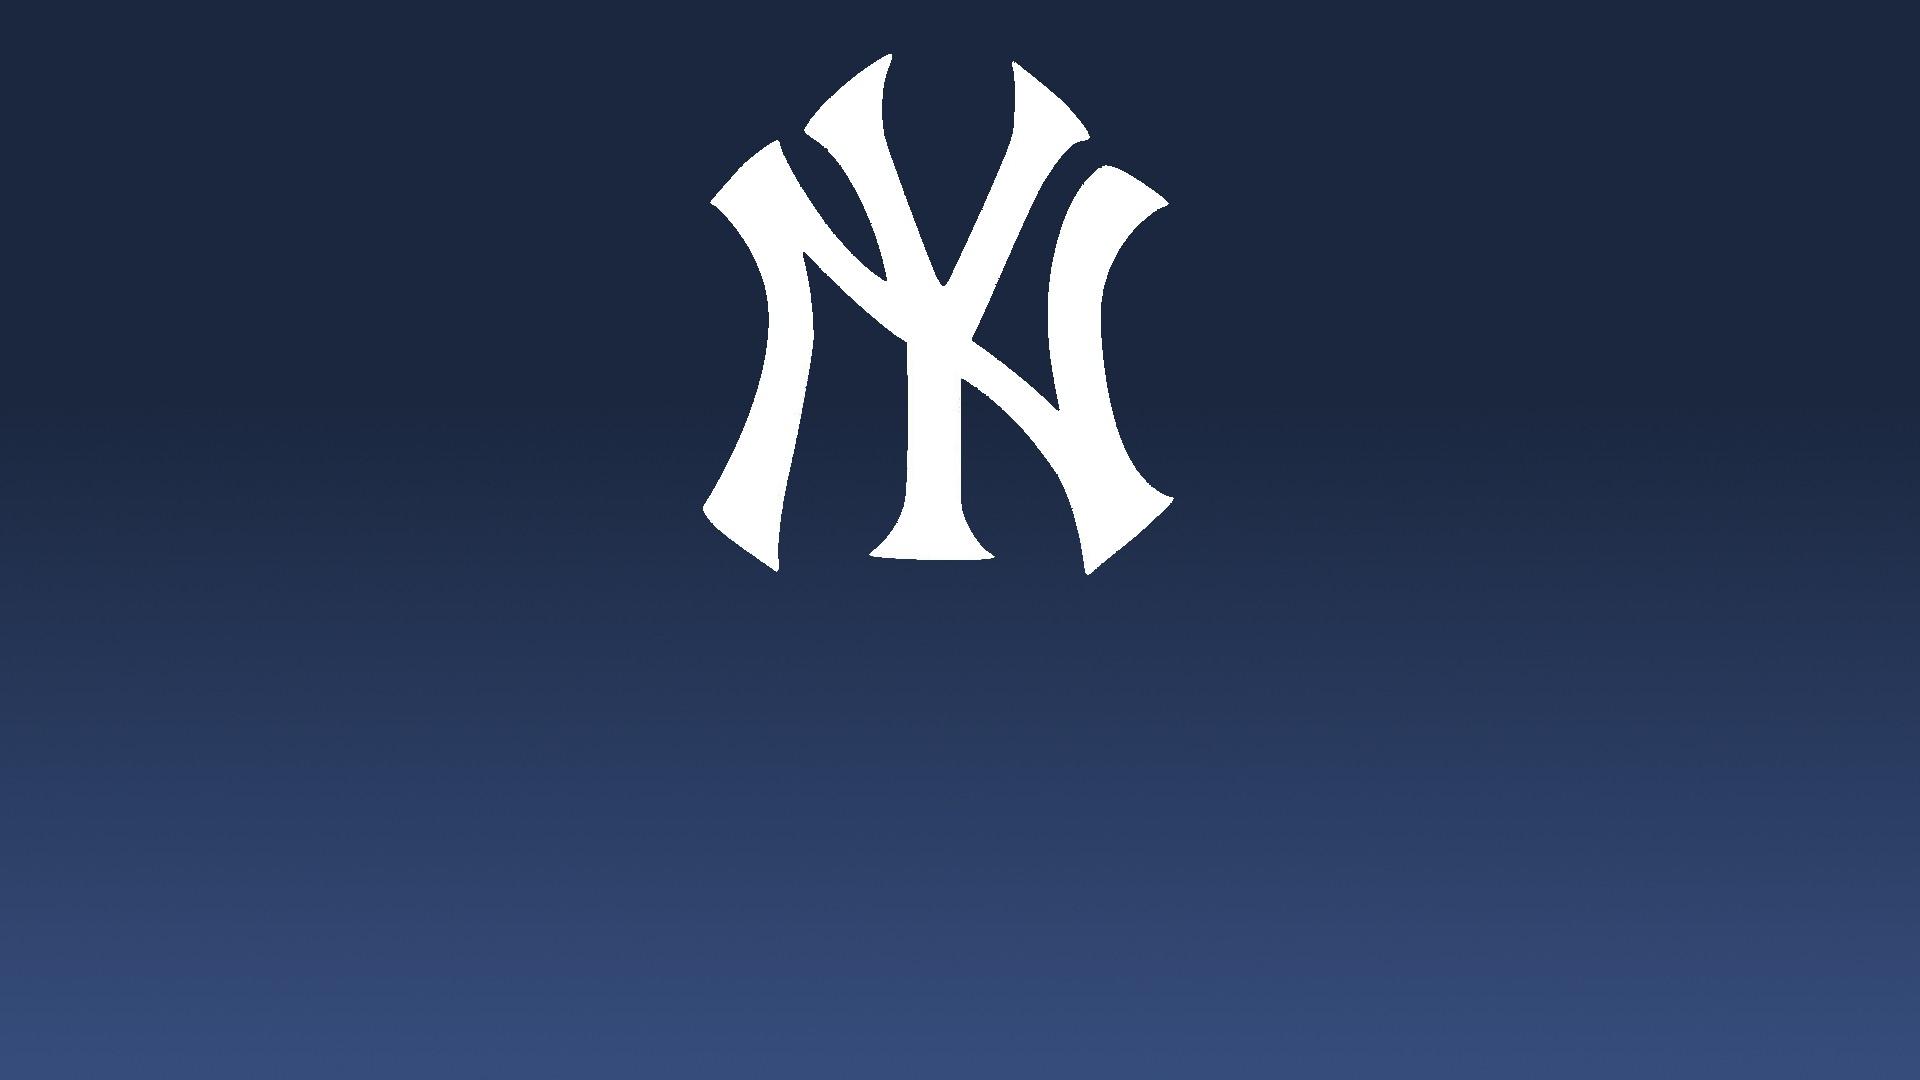 New York Yankees HD Wallpaper | Background Image ...